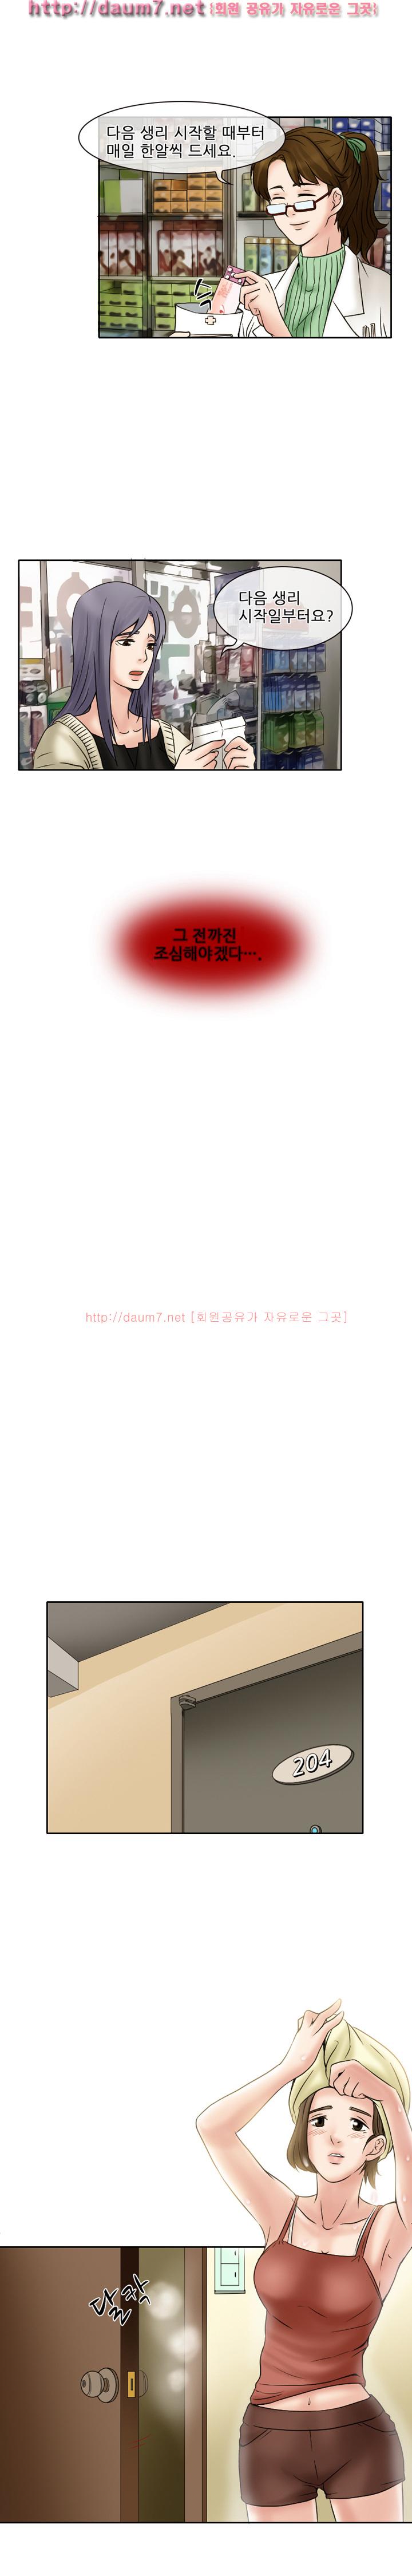 6293ce_9deefbdba779496f8f265cd26d5a9920.